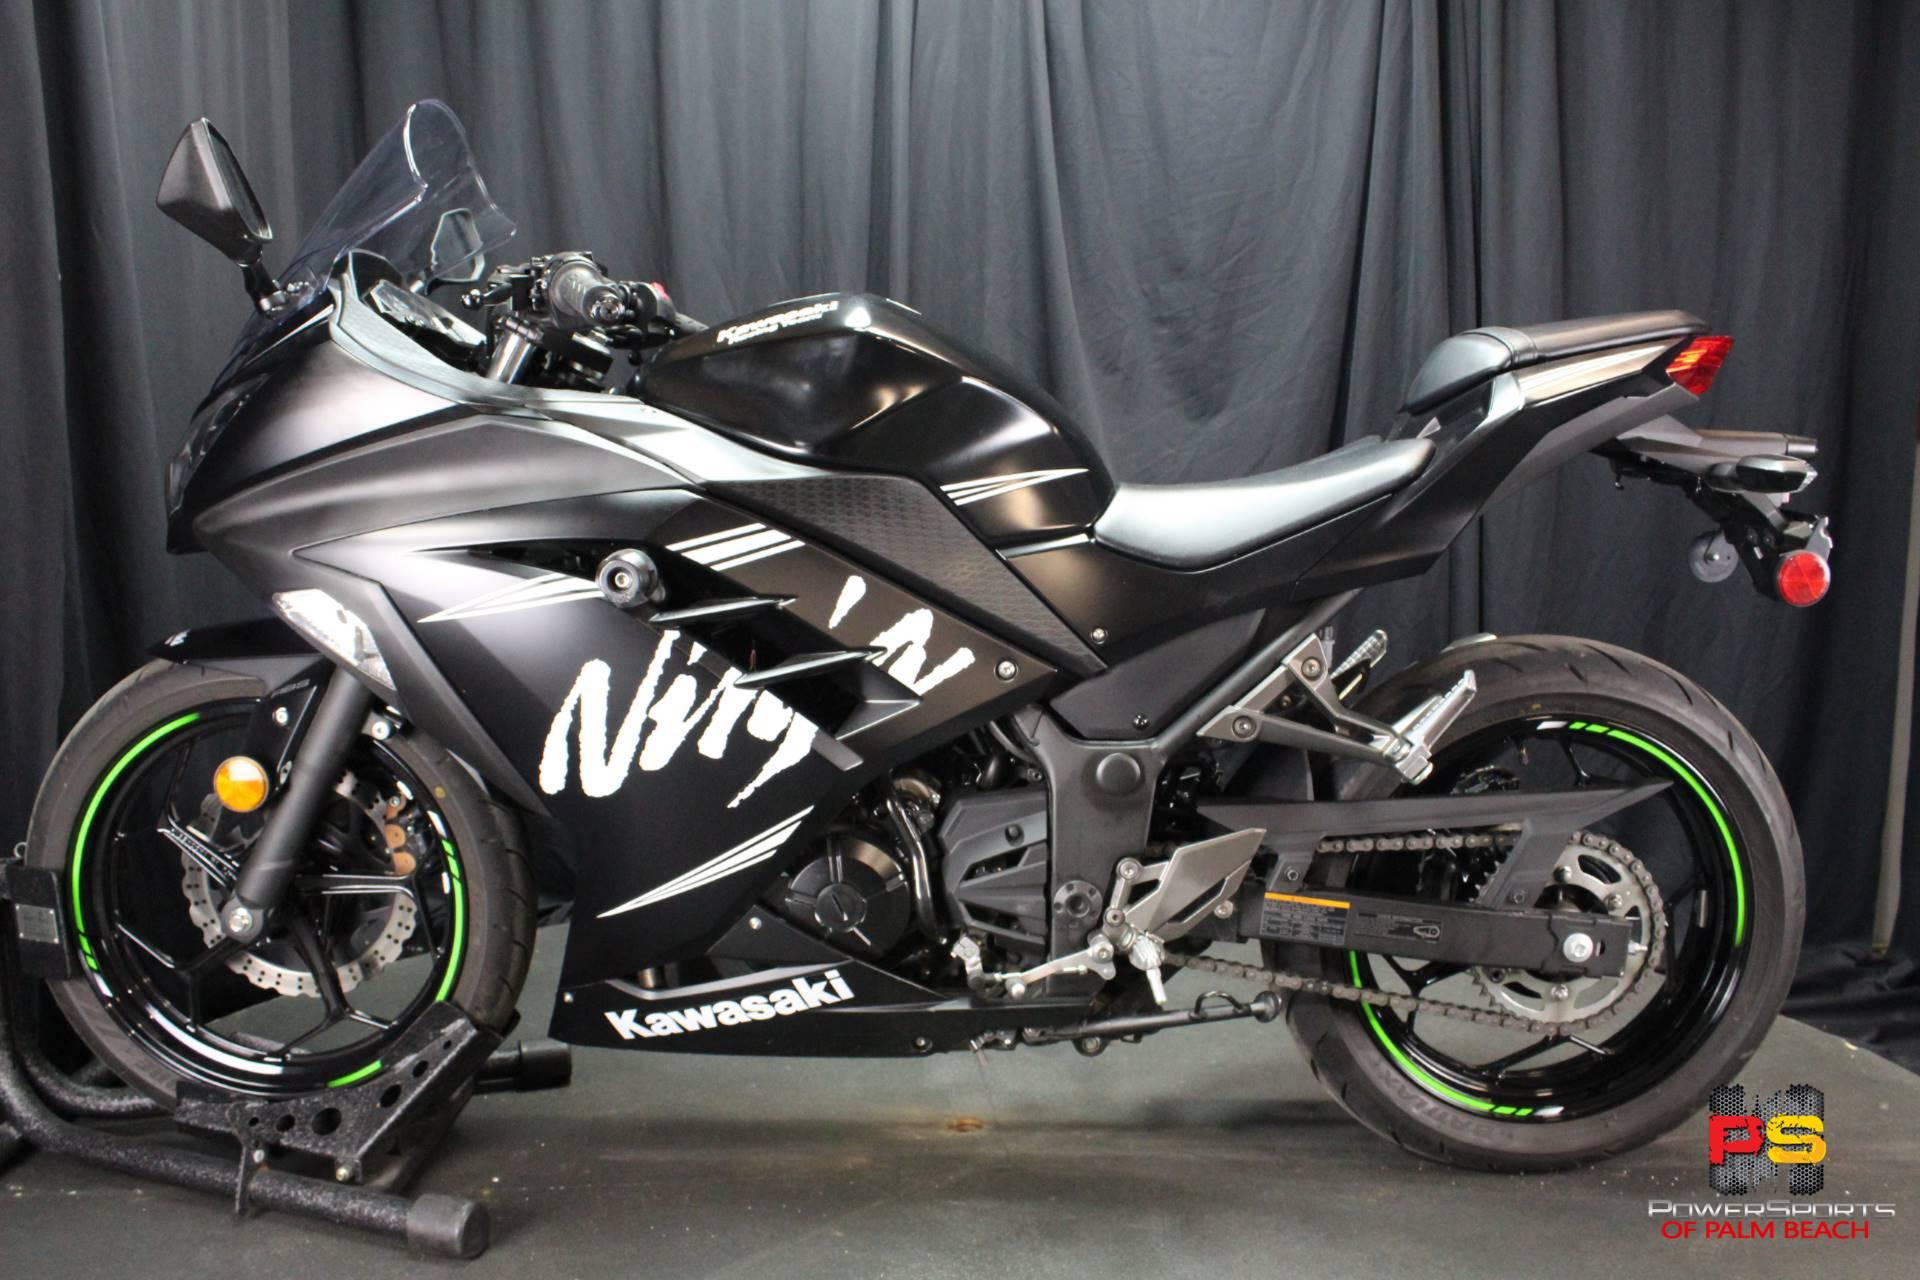 Used 2017 Kawasaki Ninja 300 Abs Winter Test Edition Motorcycles In